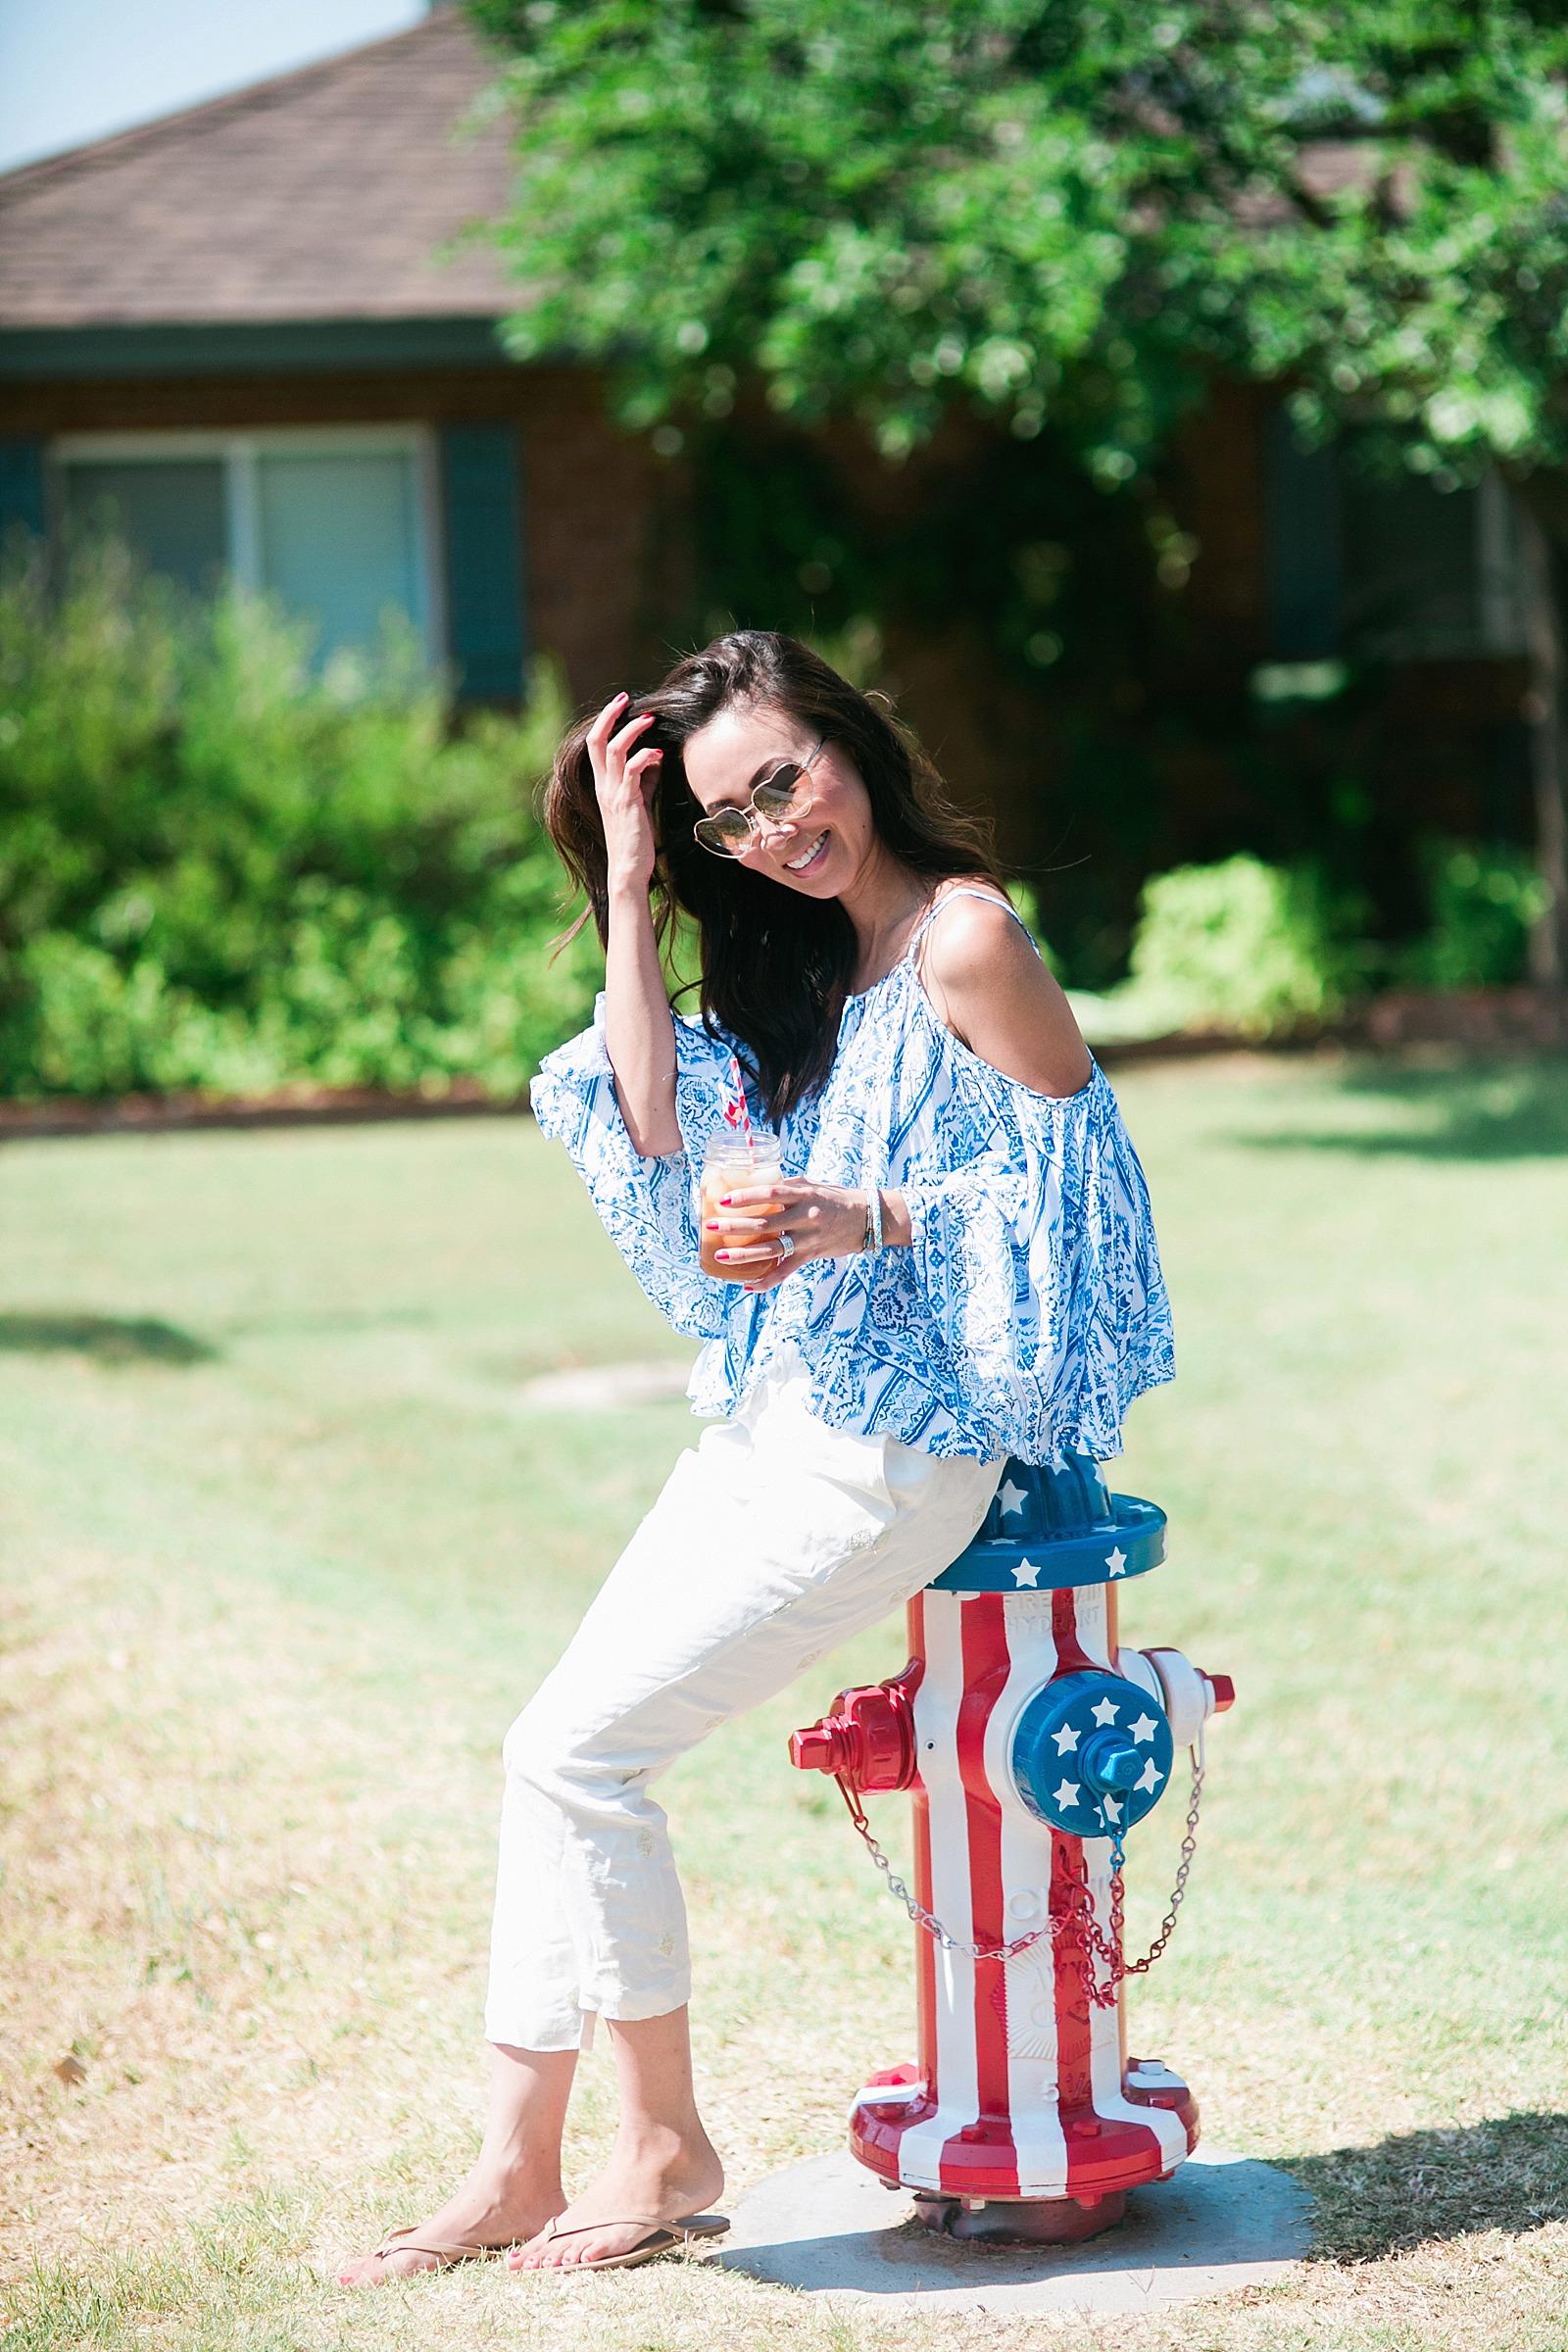 american-flag-fire-hydrant-painted-artistic-lifestyle-blogger-diana-elizabeth-blog-arizona-fashion-pool-summer-time_0097